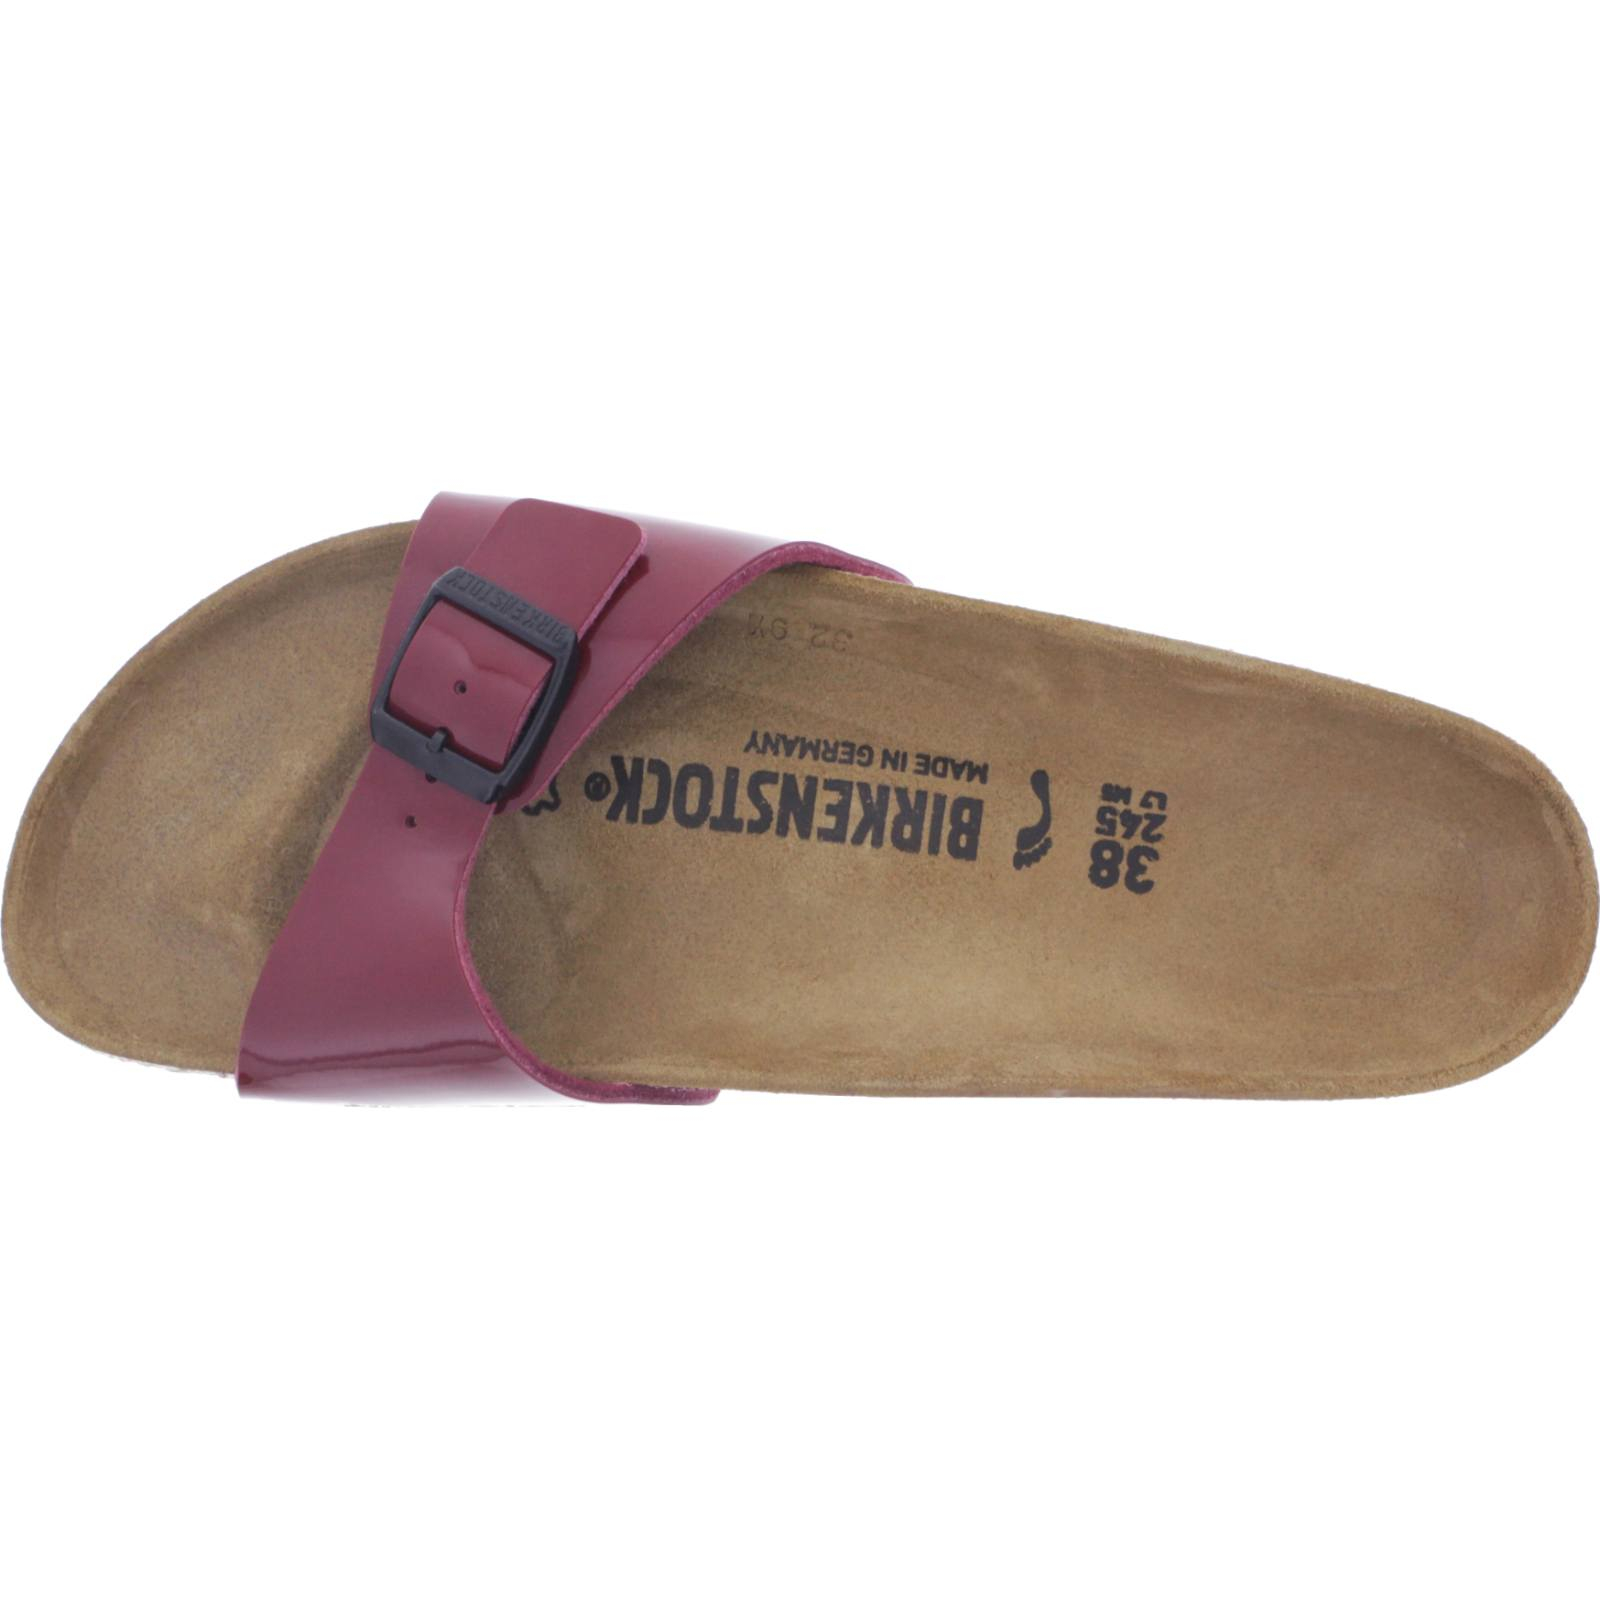 Birkenstock Modell: Madrid Port Rot Lack Weite: Schmal Art: 1014315 Damen Sandalen